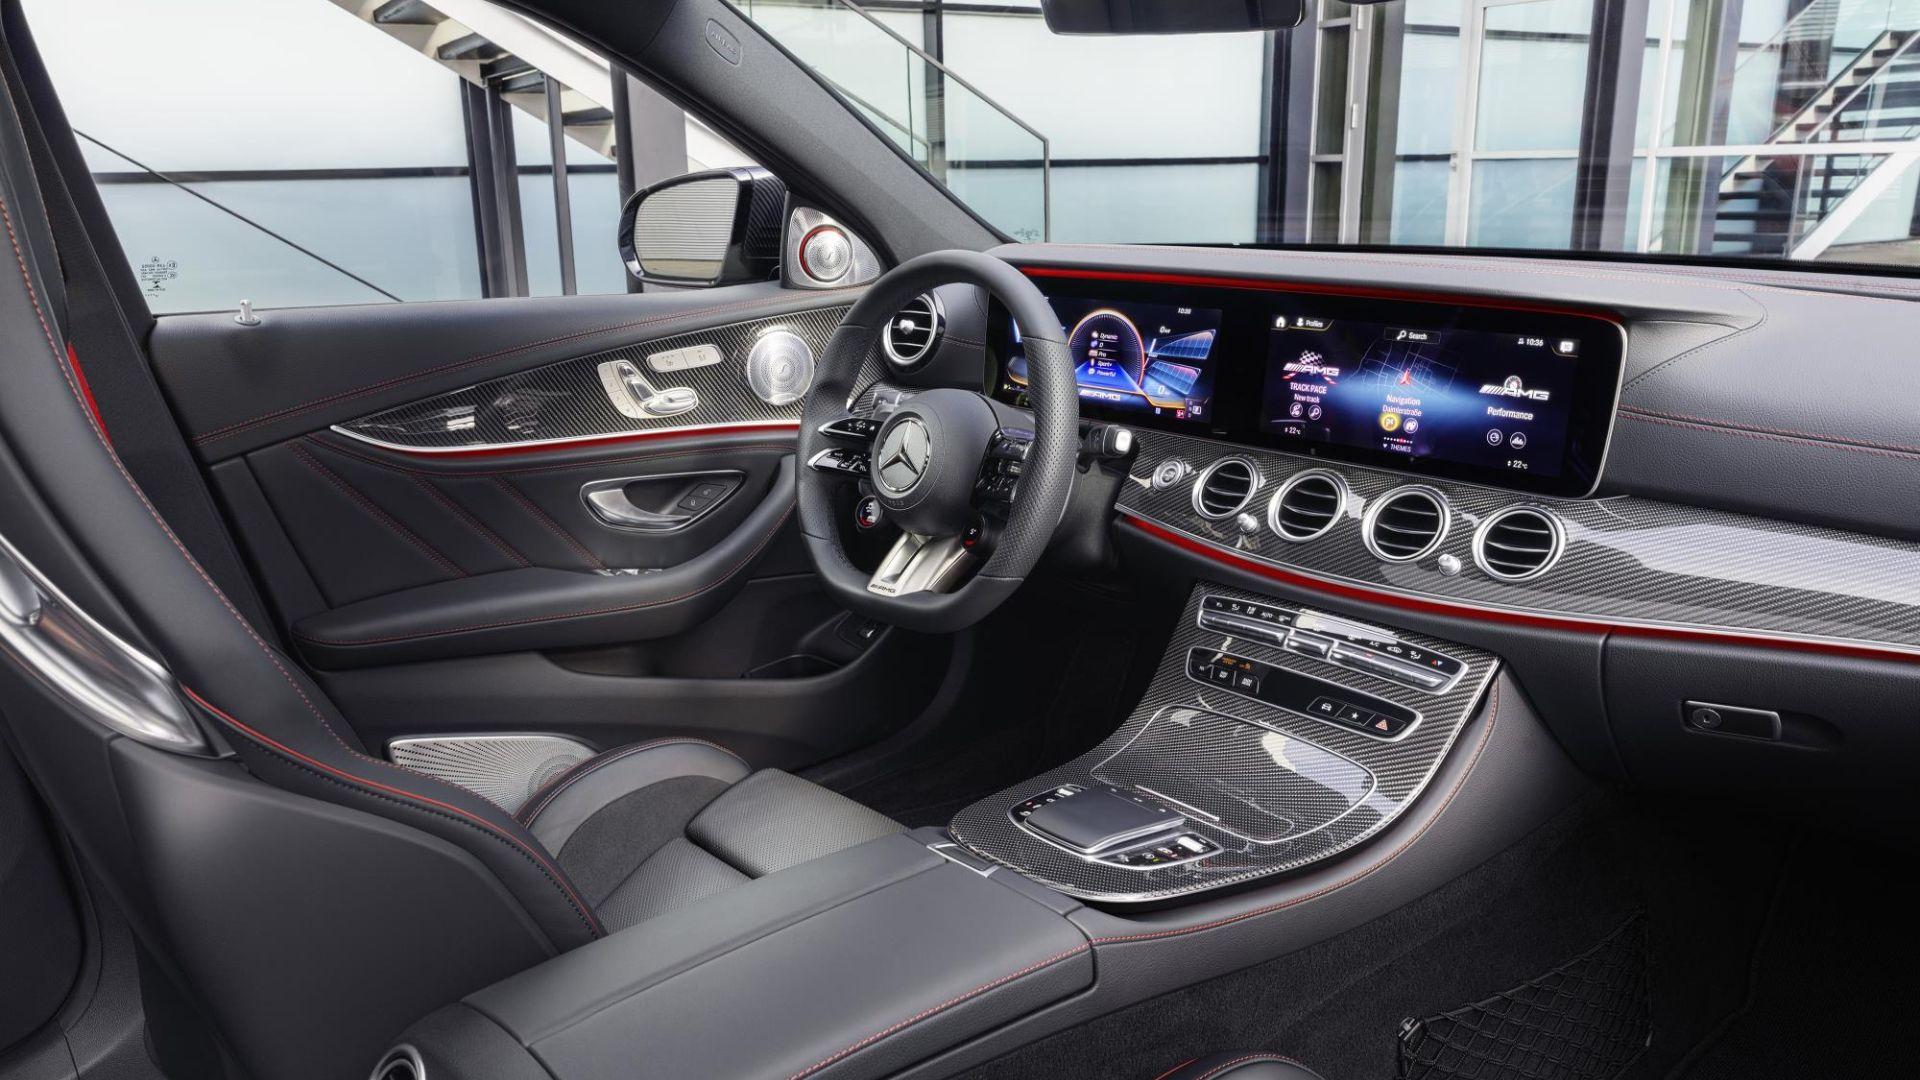 Mercedes MBUX horoscope update